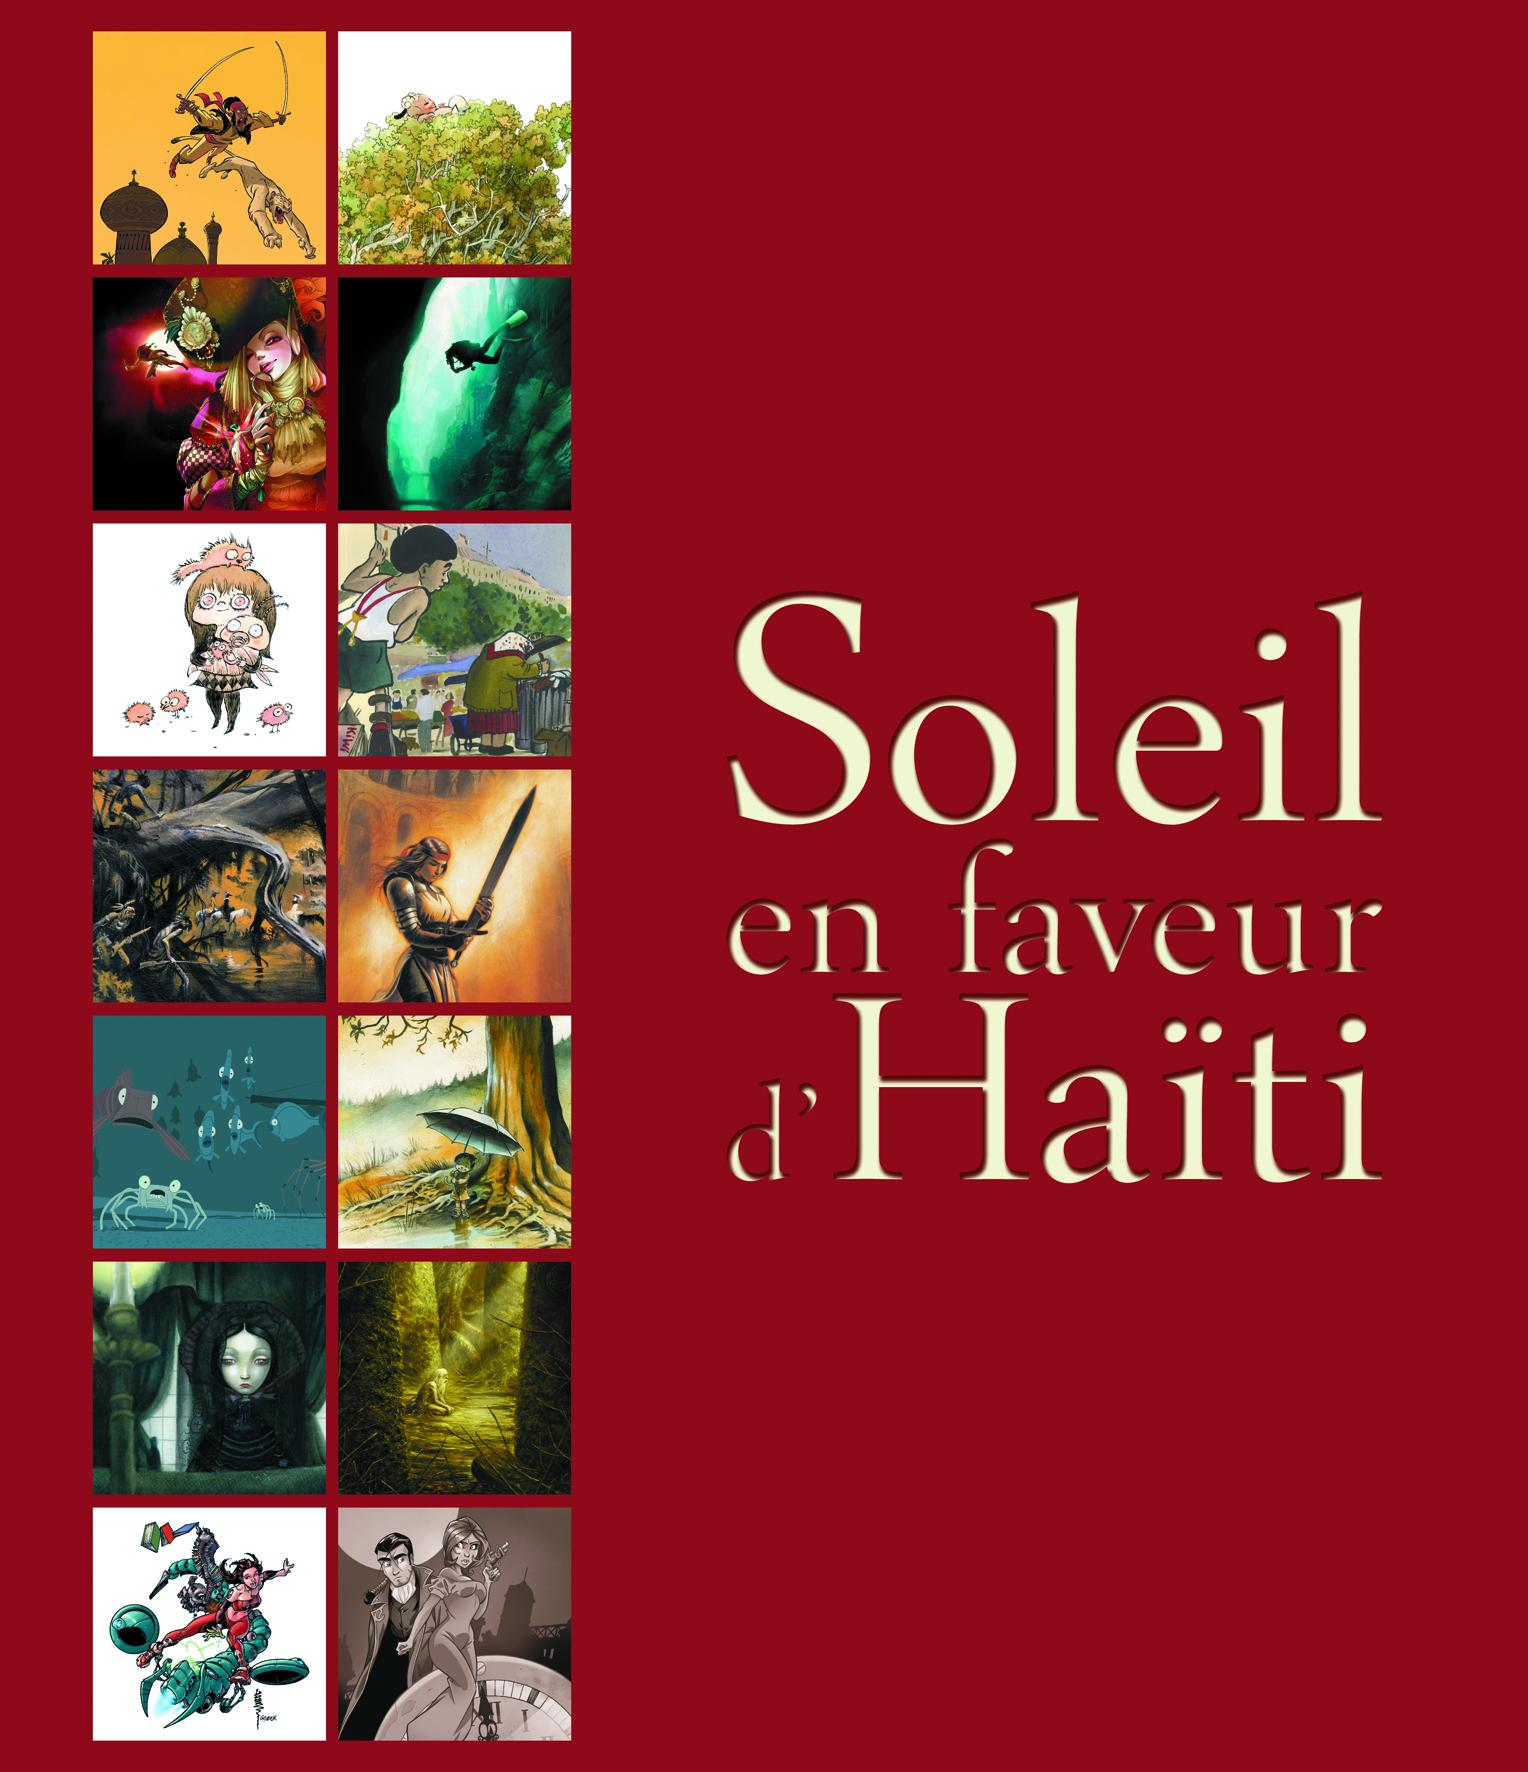 Soleil en faveur d'Haïti 1 - Soleil en faveur d'Haïti